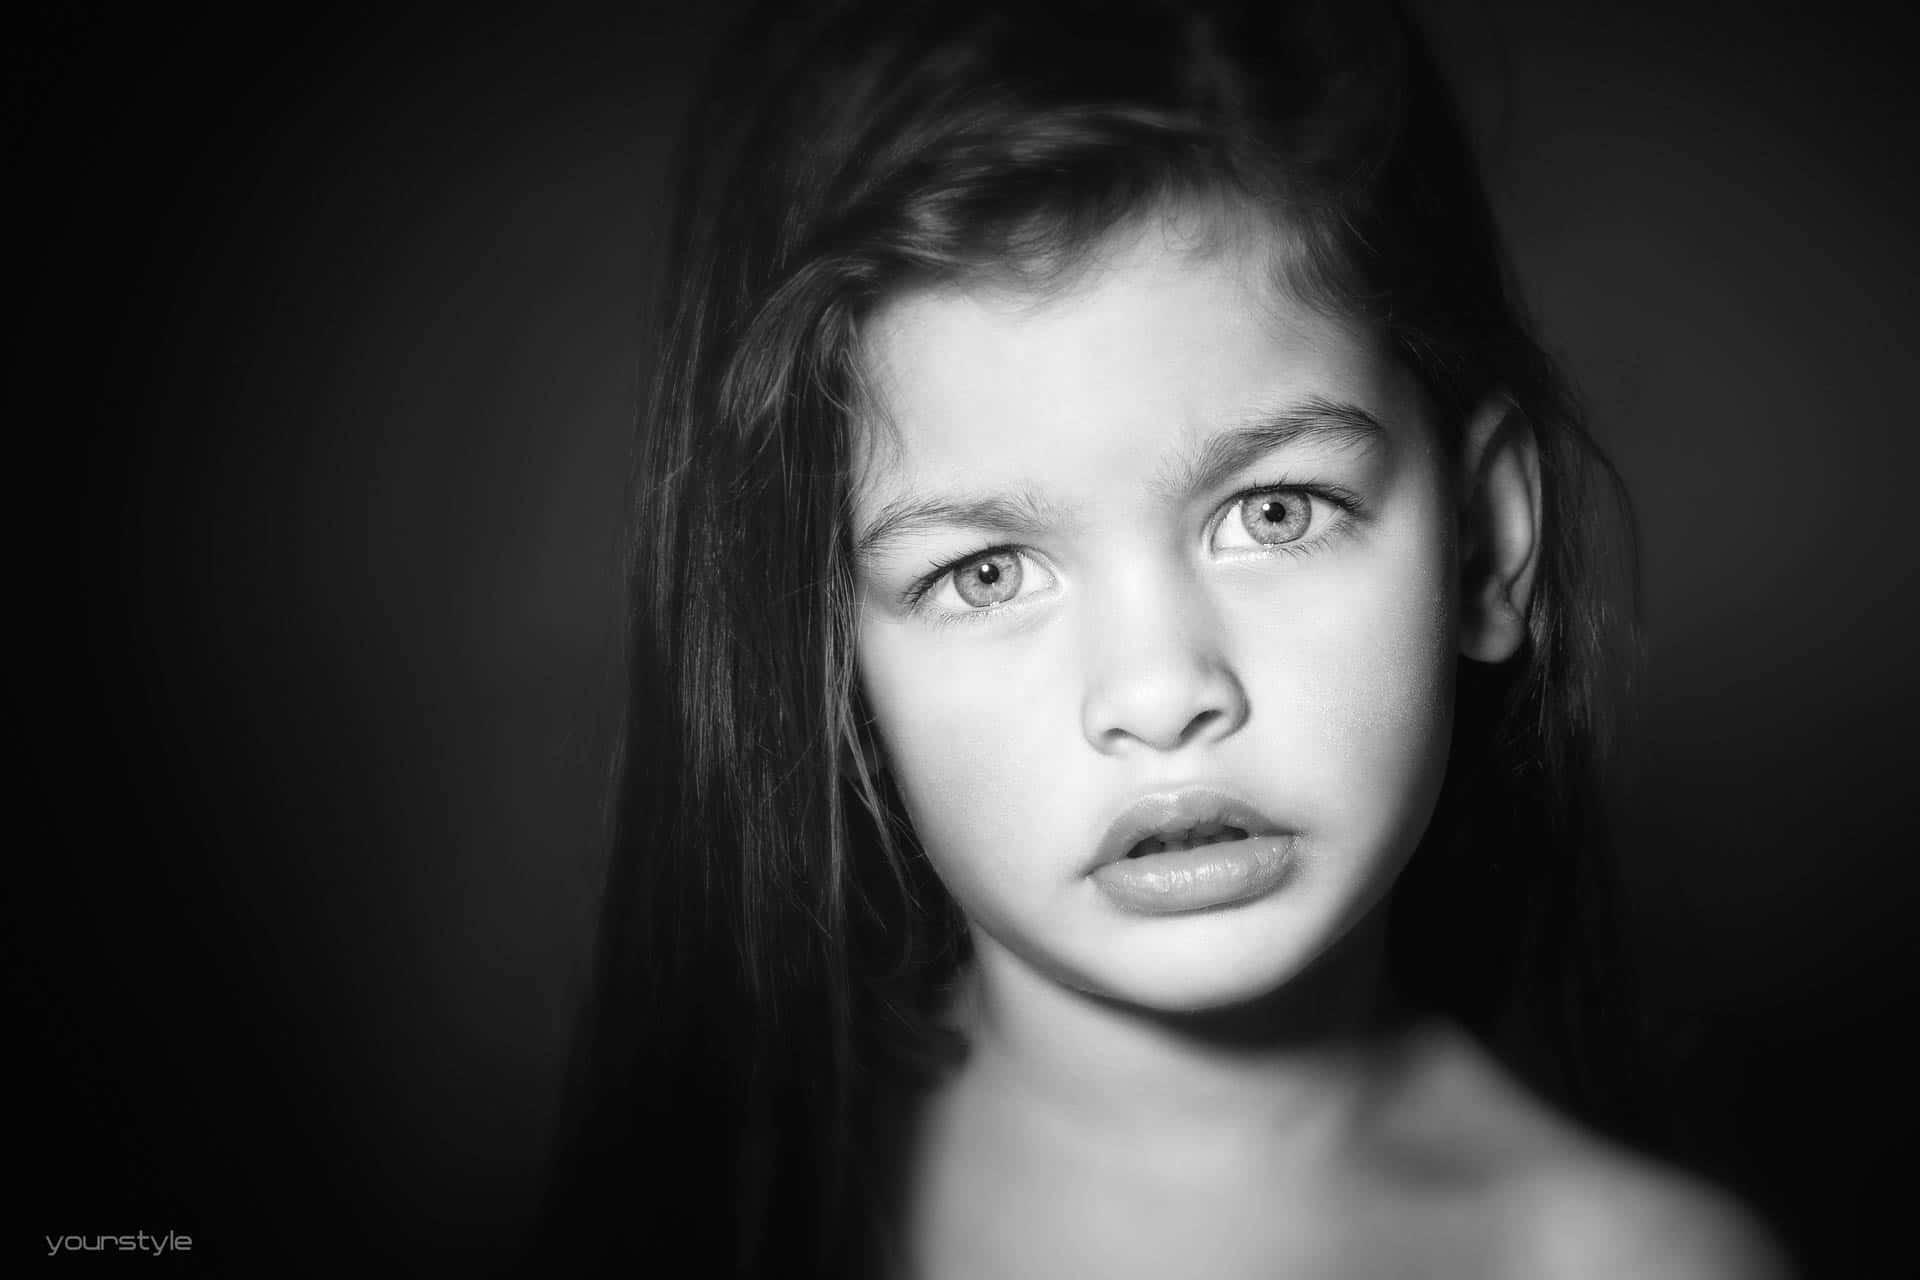 Kinderfotografie zwart-wit